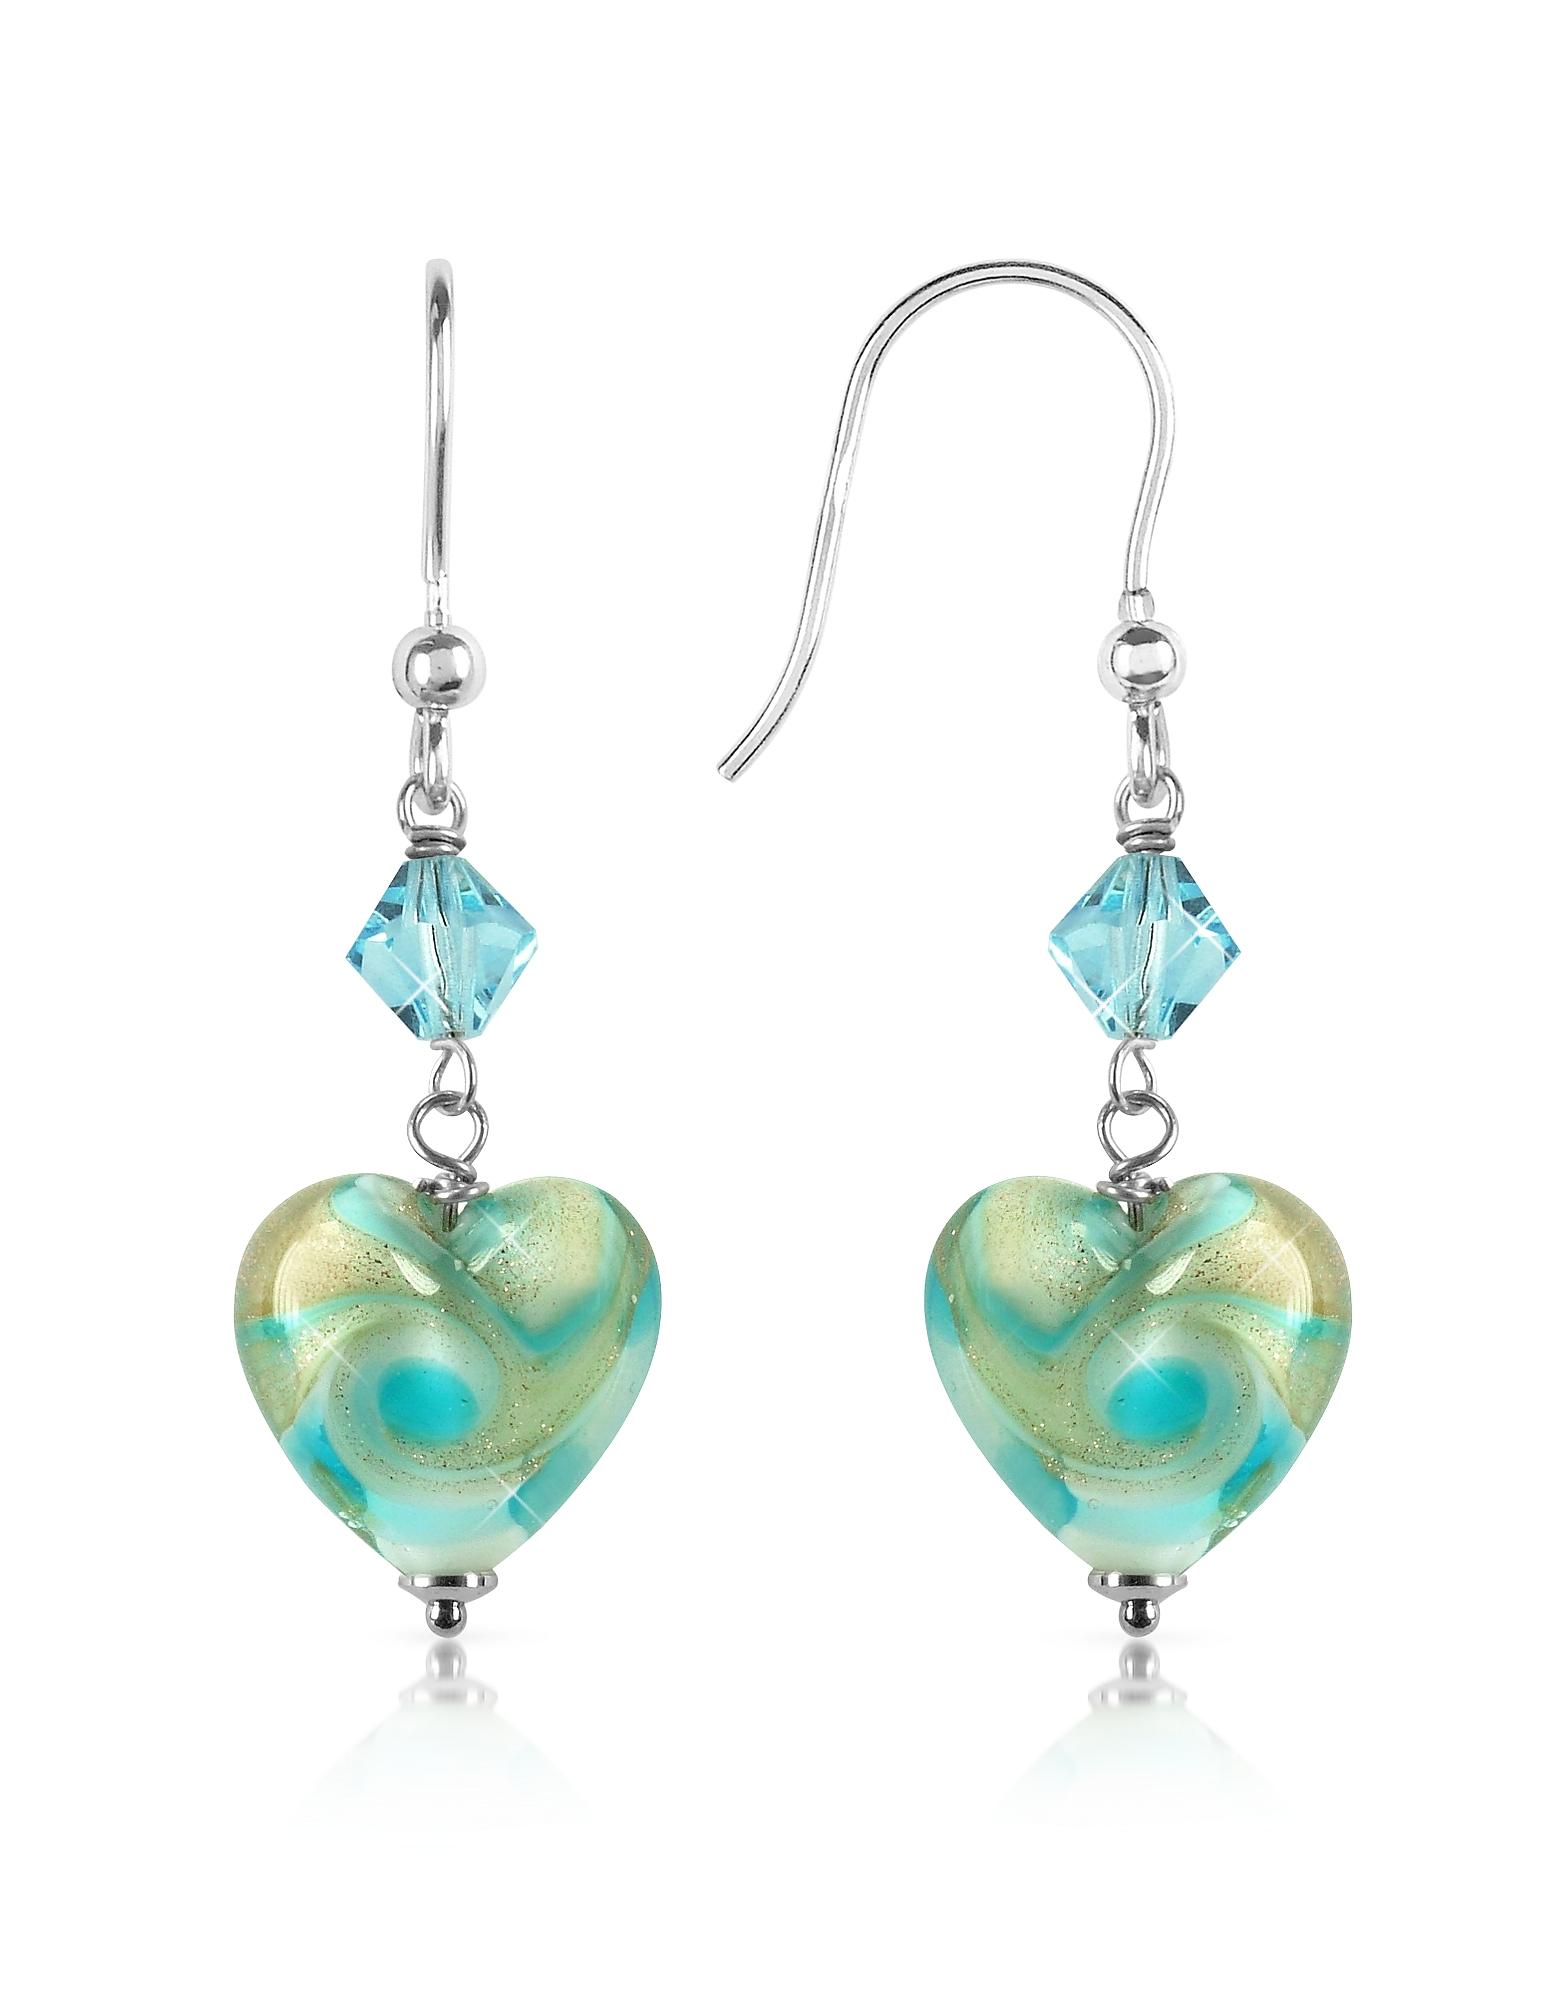 House of Murano Earrings, Vortice - Turquoise Swirling Murano Glass Heart Earrings